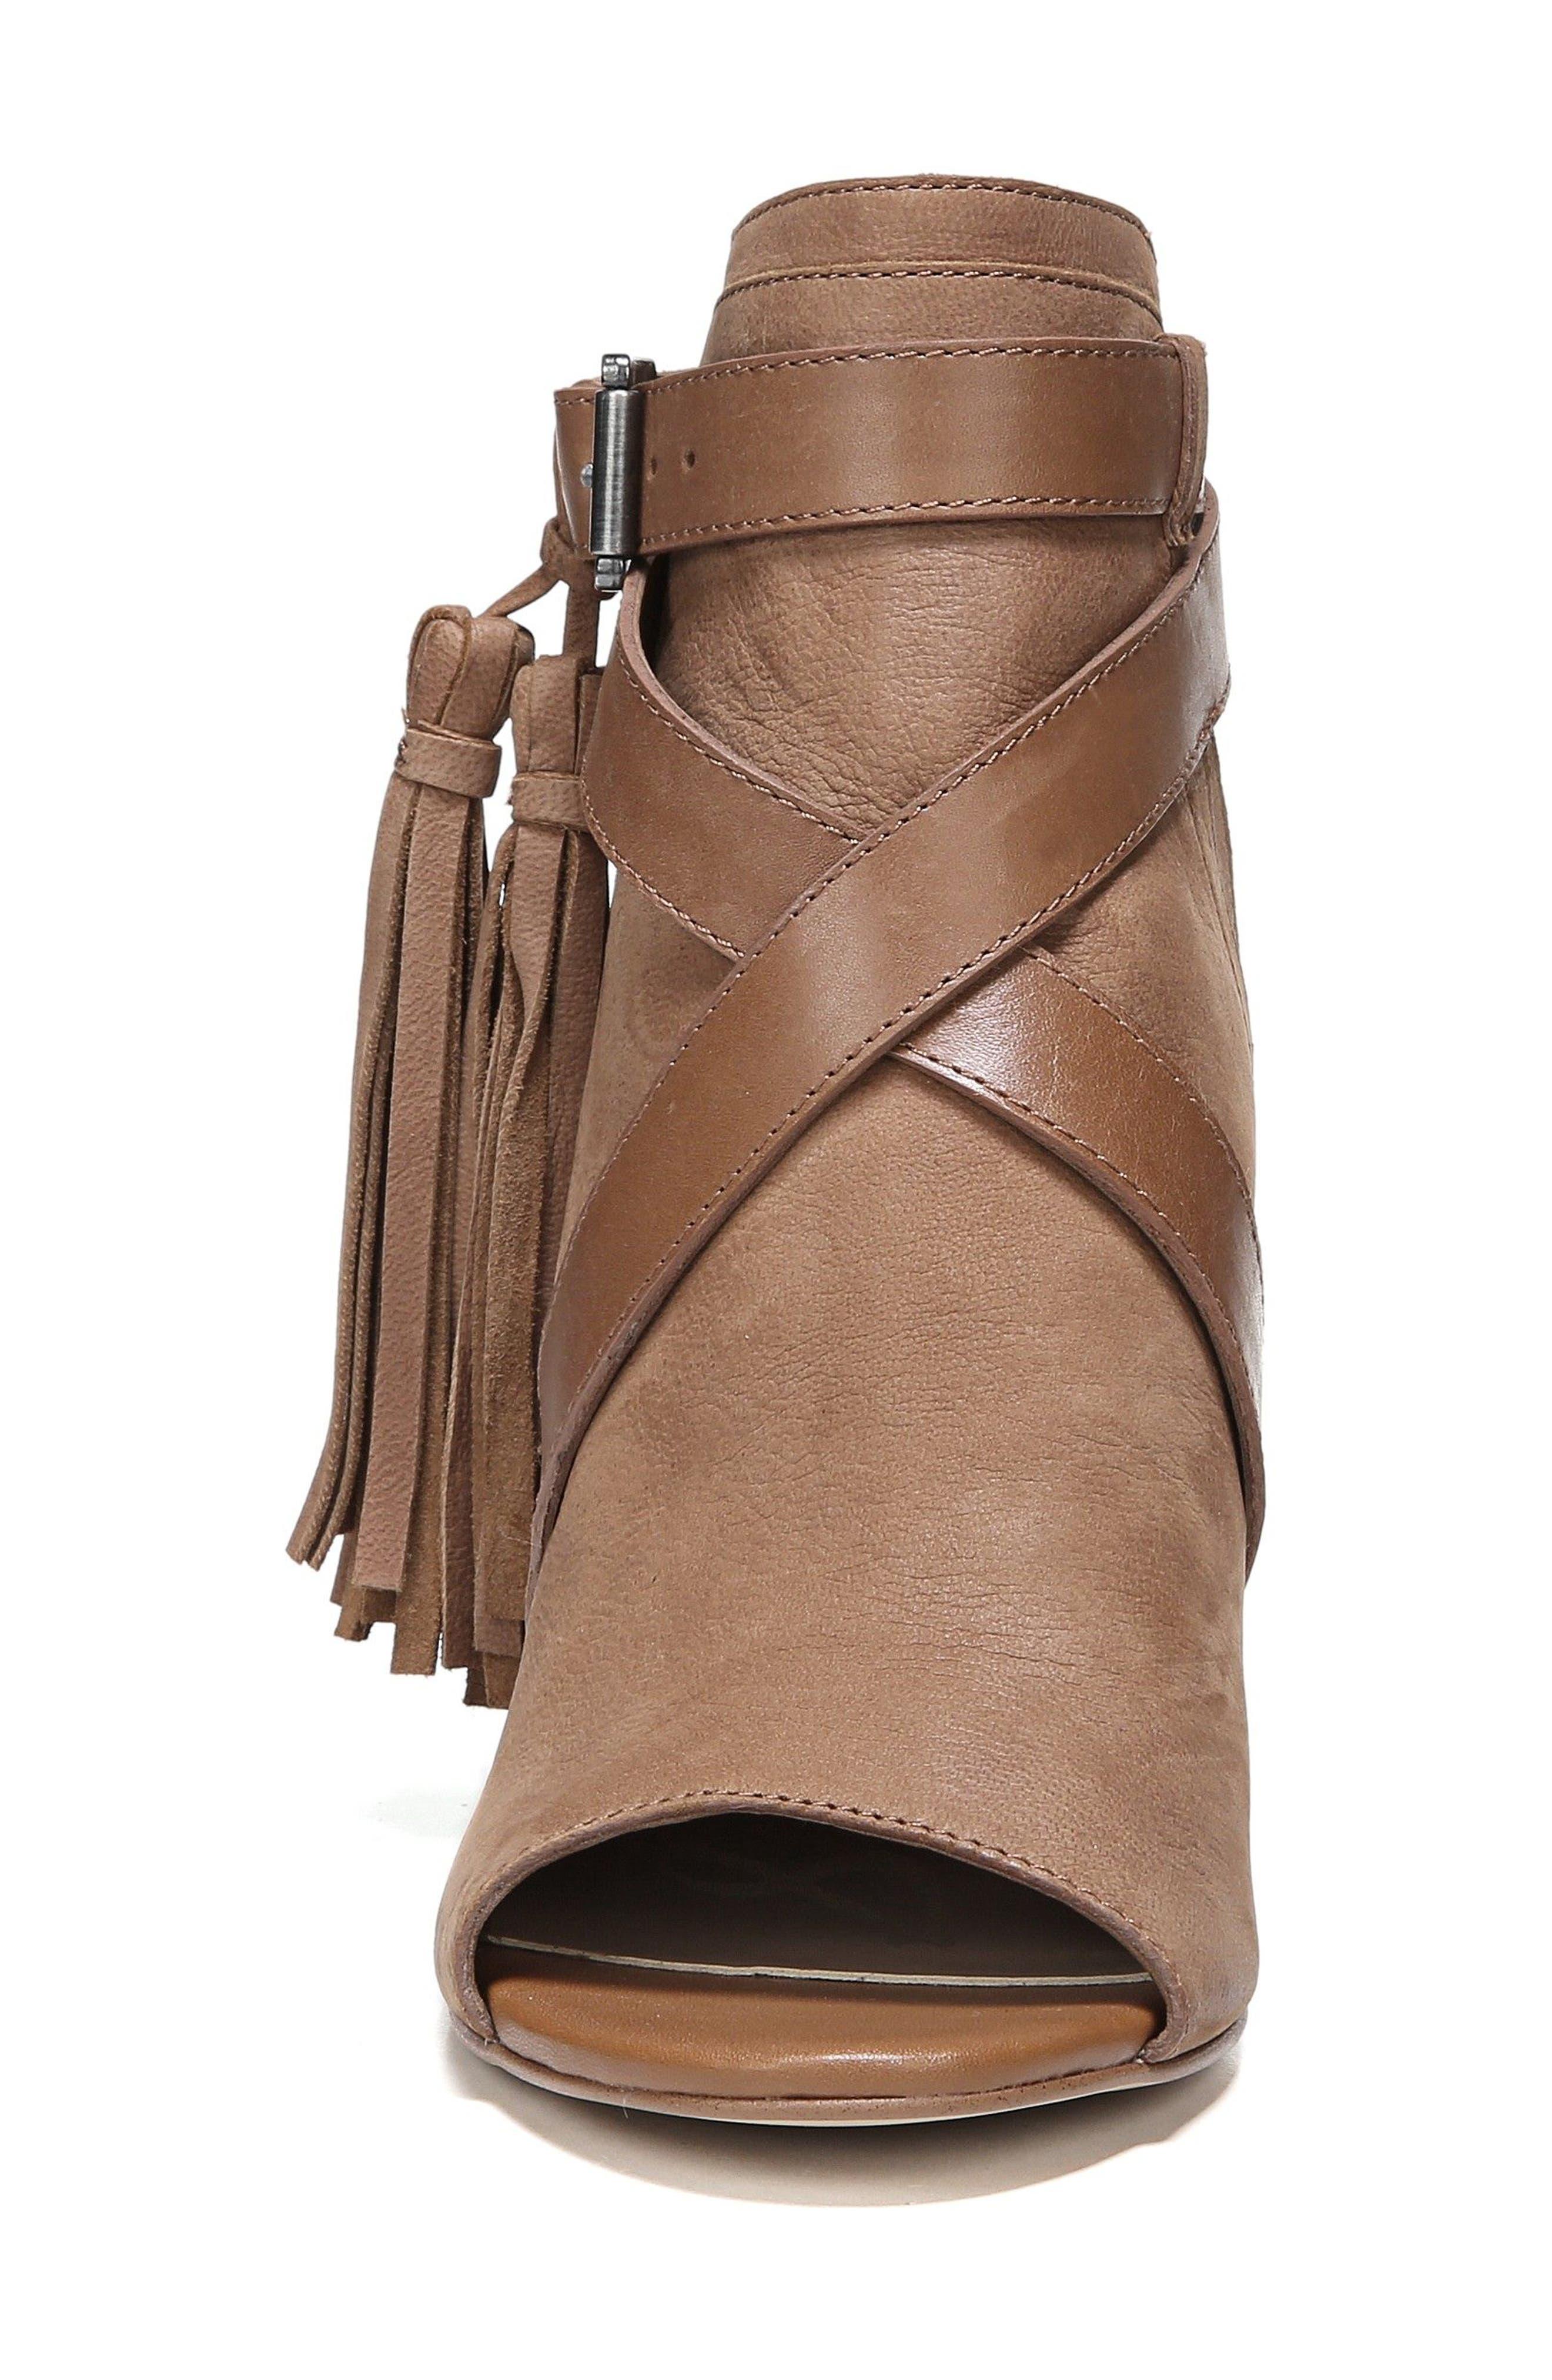 Vermont Block Heel Sandal,                             Alternate thumbnail 4, color,                             Deep Saddle Nubuck Leather